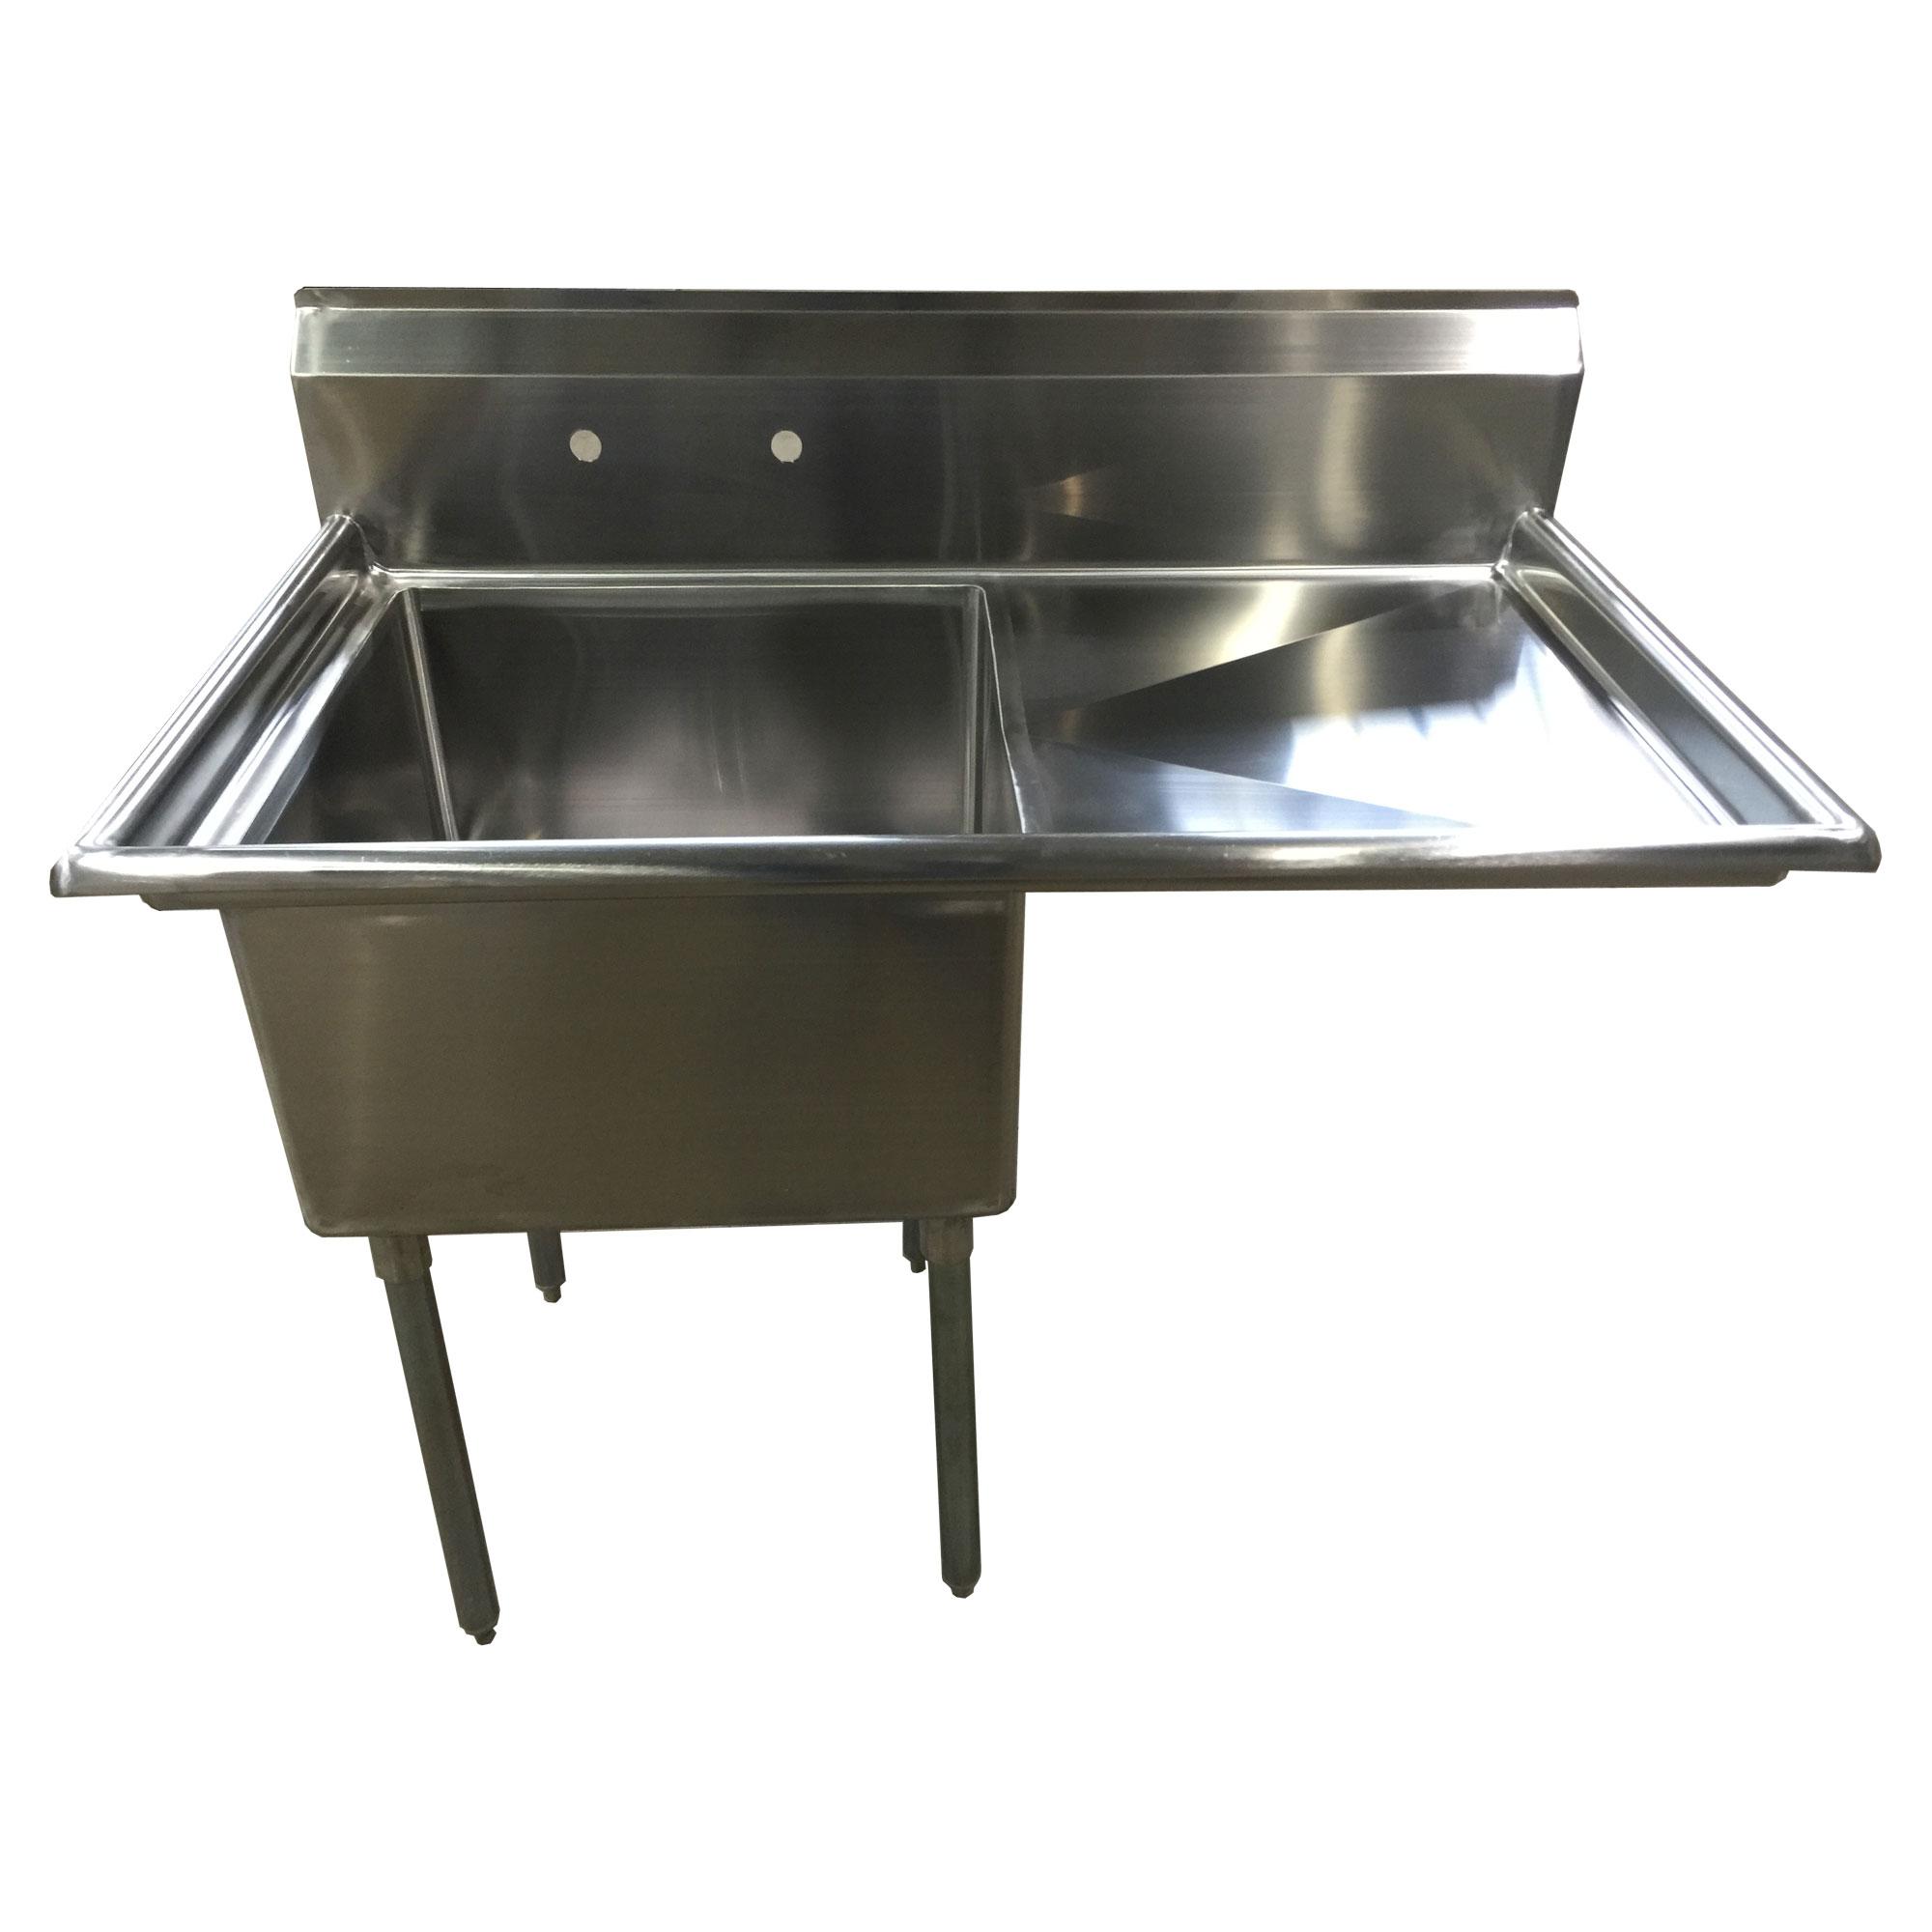 Image of Atlantic Metalworks 1CS-242414-1*- 24x24x14 Bowl Economy 1 DB - 1 Comp. Sink